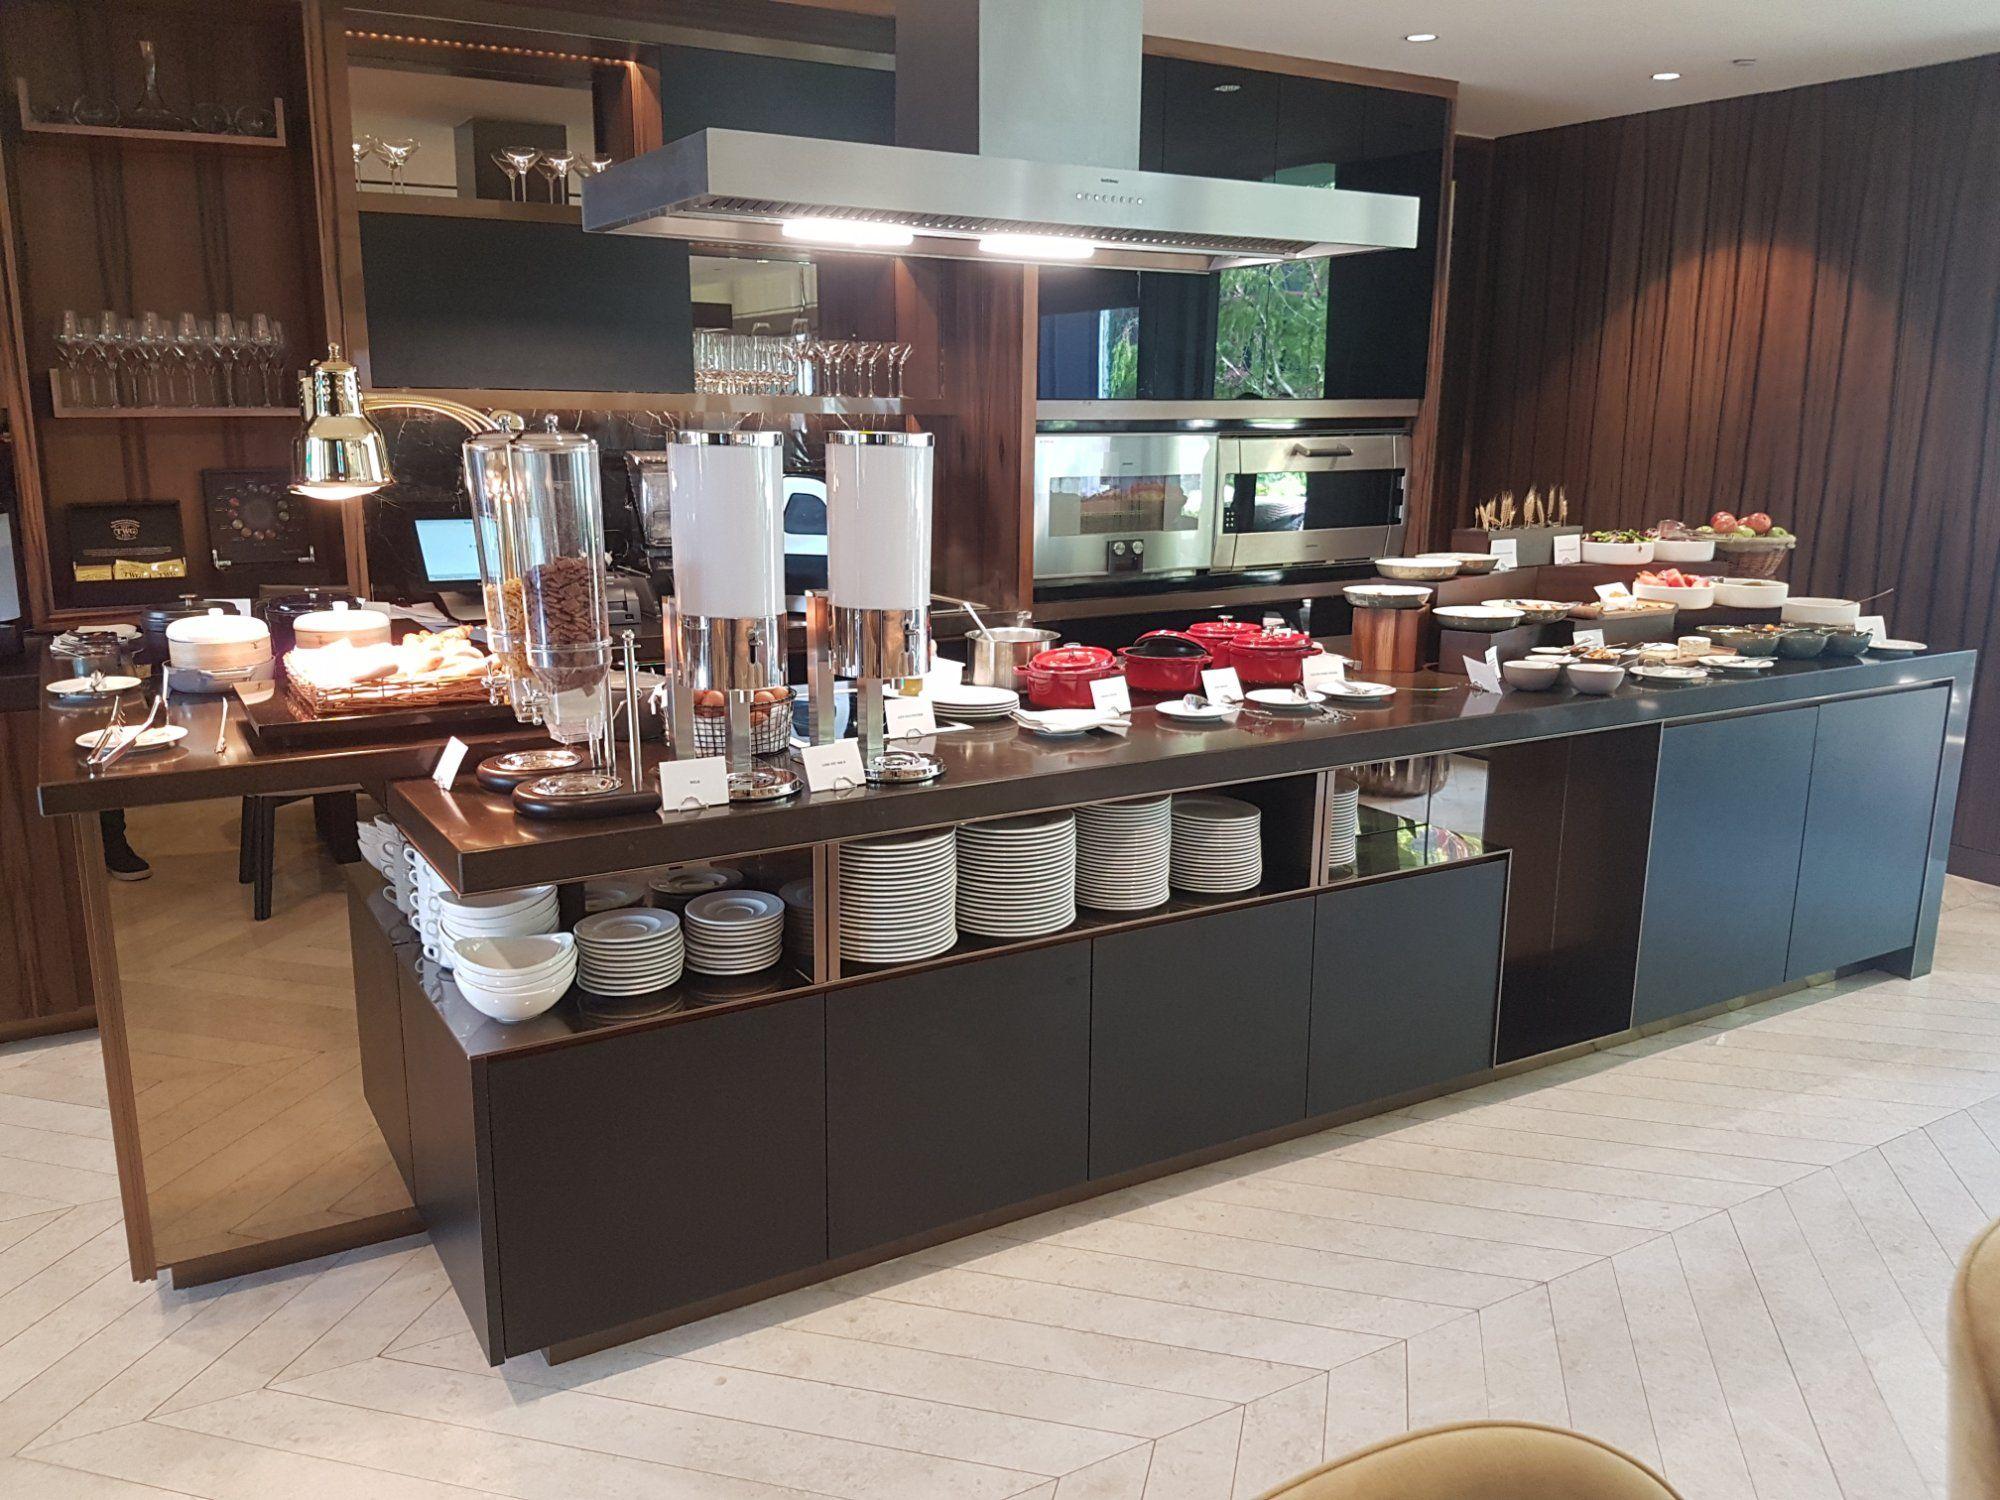 Sofitel Singapore City Centre Updated 2018 Hotel Reviews Price Comparison And 562 Photos Tripadvisor Hotel Reviews Hotel Singapore City